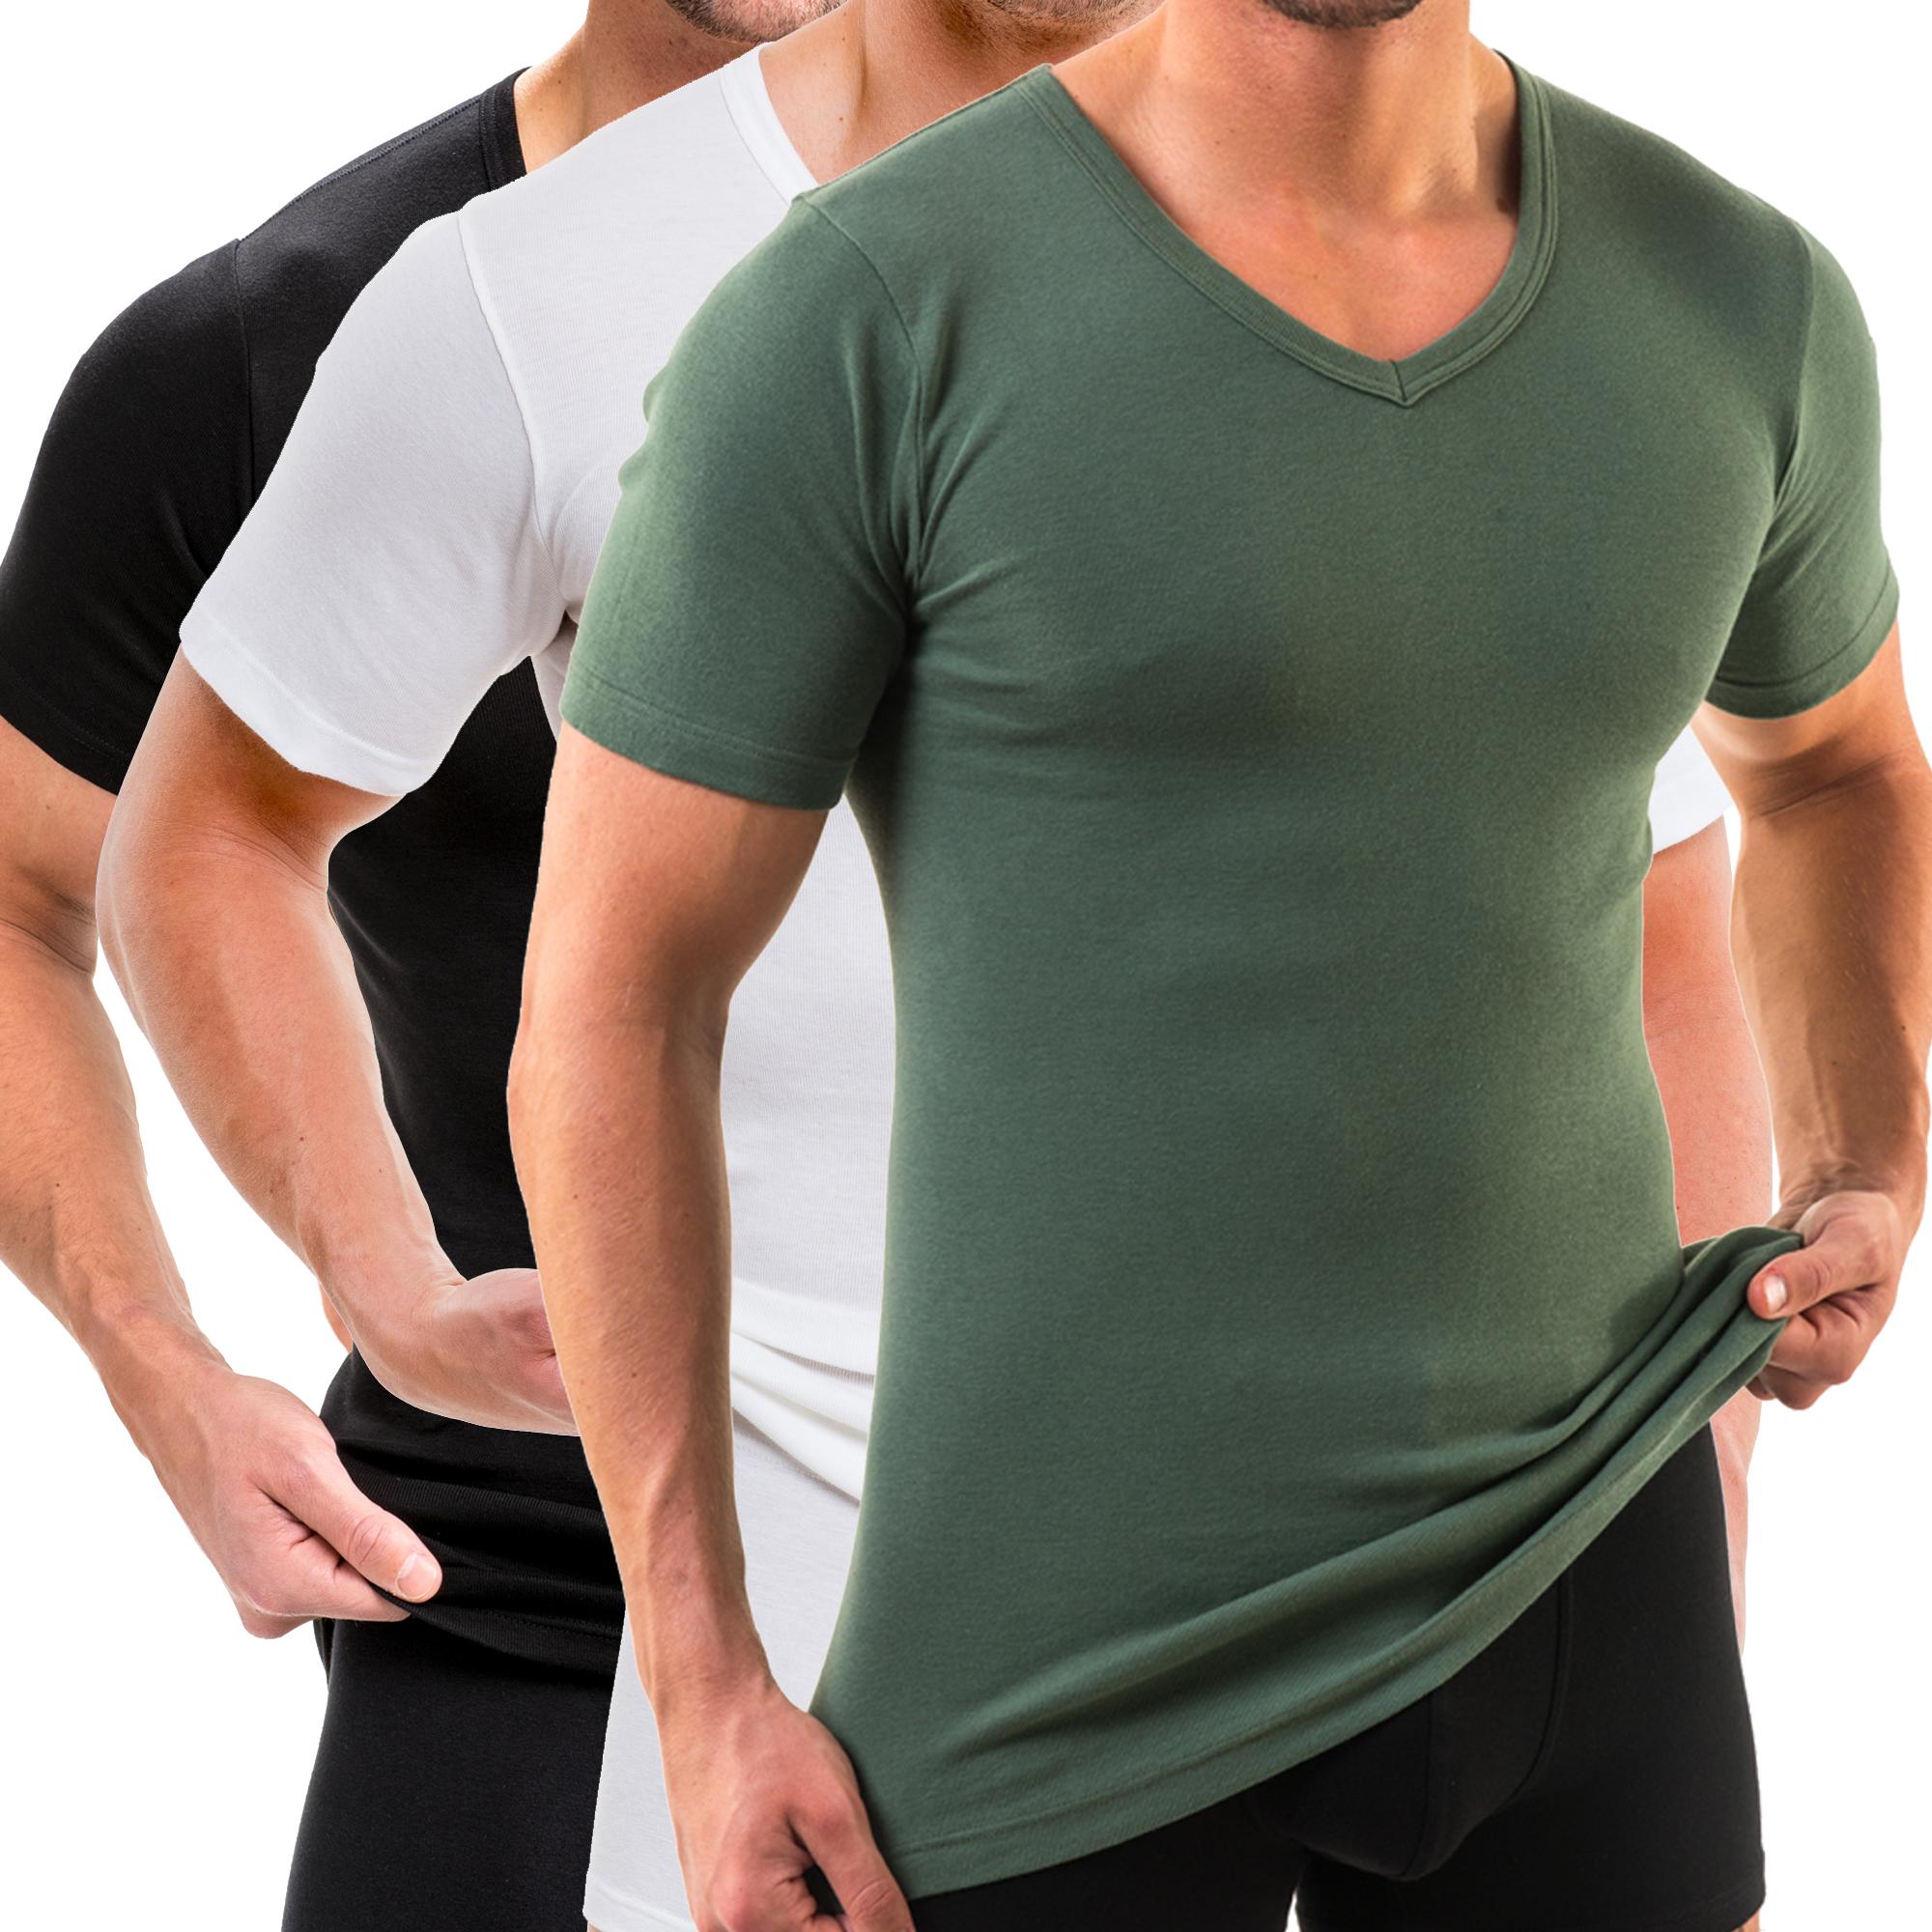 HERMKO 4880 3er Pack Herren kurzarm Shirt mit V-Ausschnitt   HERMKO ... 49eeeea43c